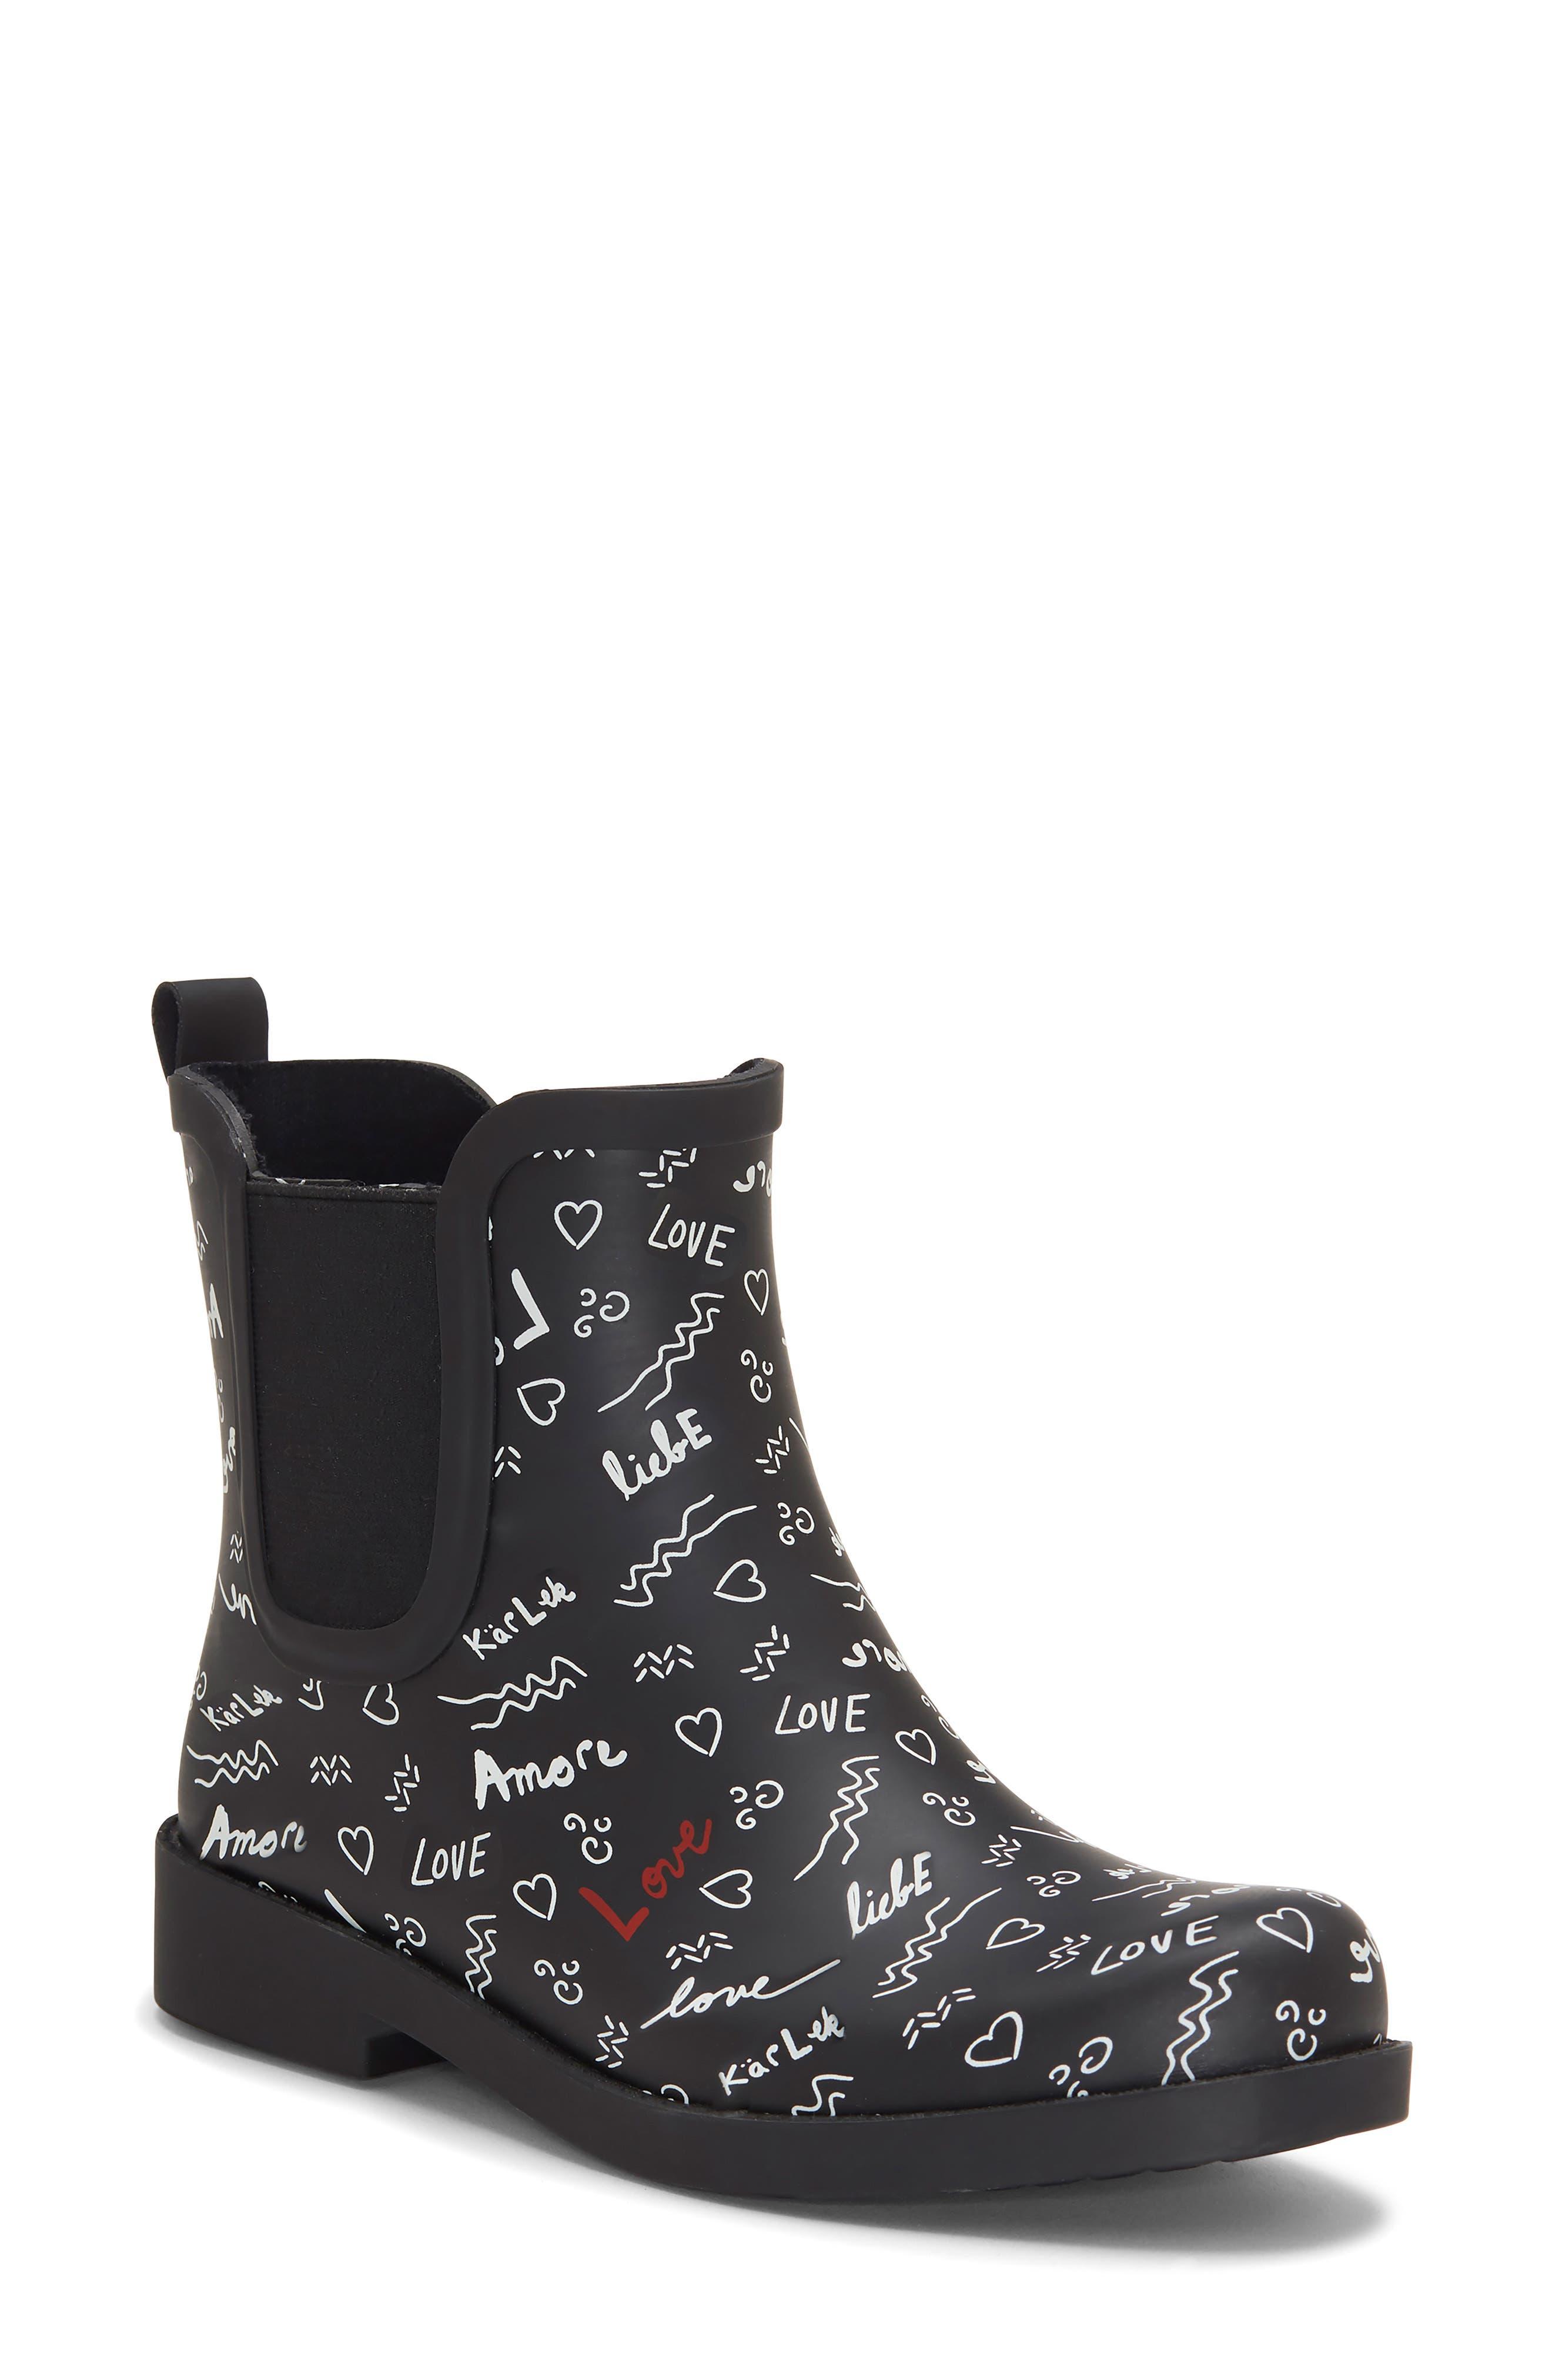 Wallita Rain Boot,                             Main thumbnail 1, color,                             BLACK/ WHITE MATTE RUBBER